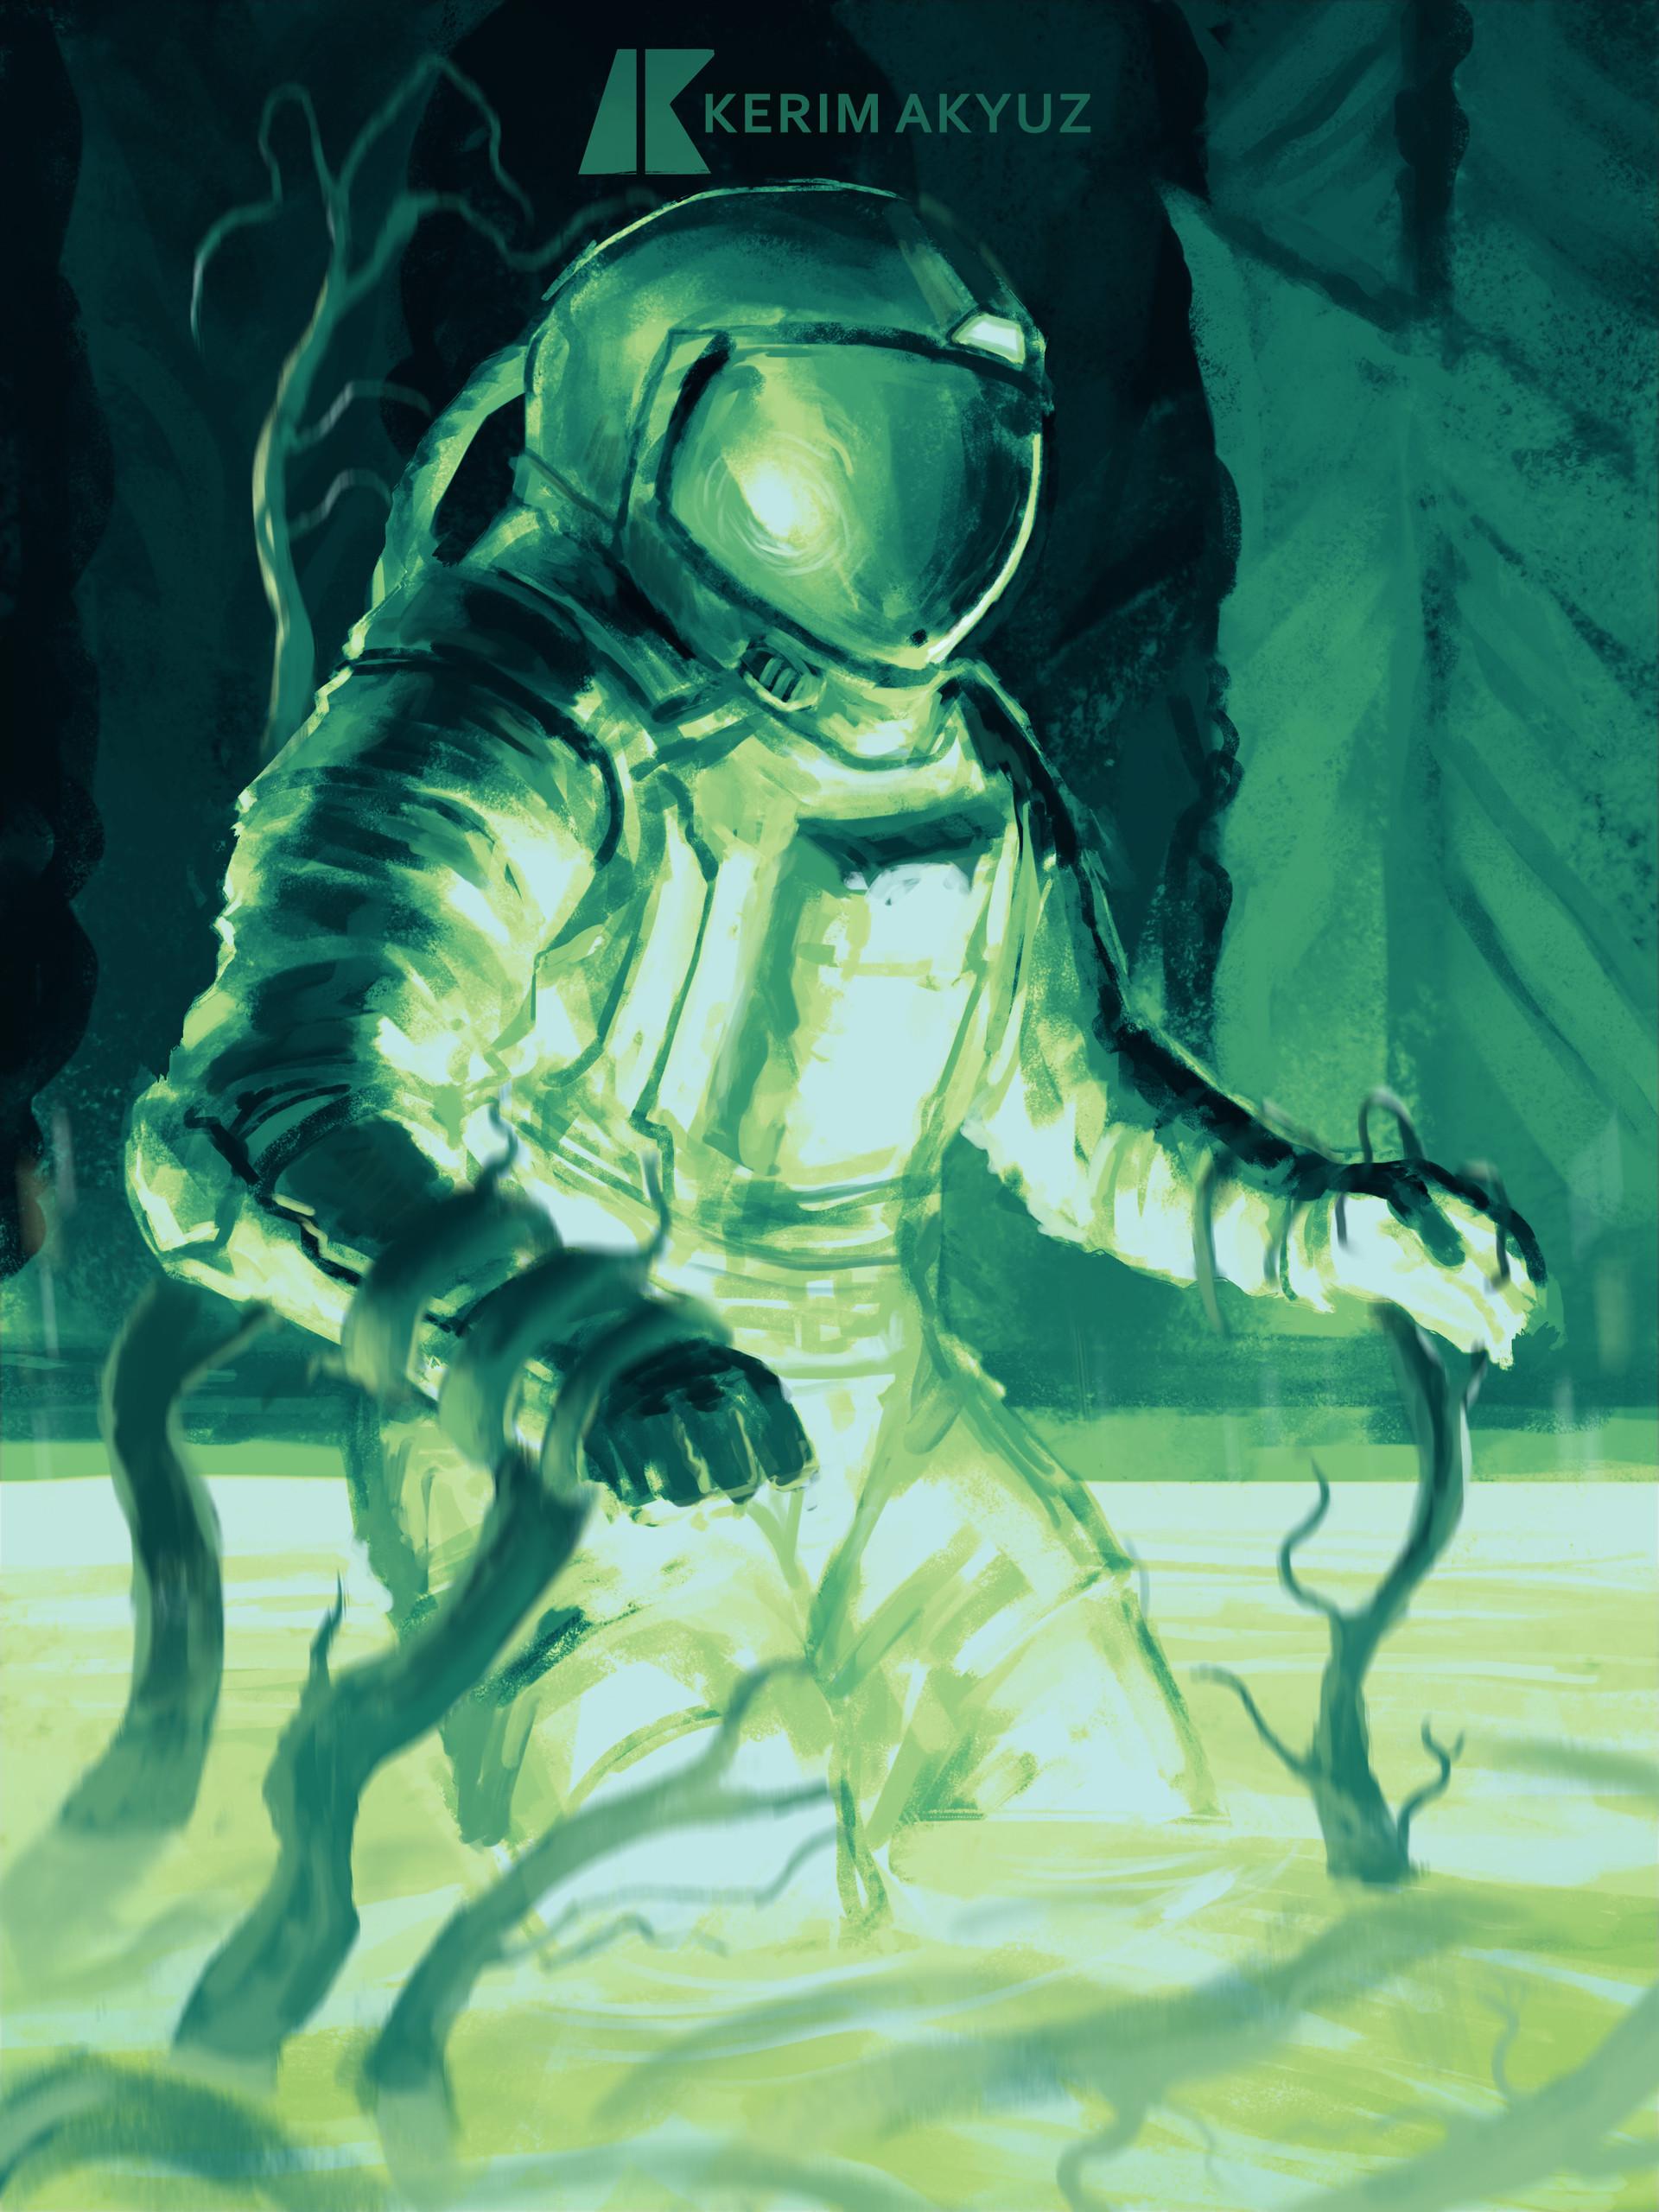 Kerim akyuz 182 astronautslife6